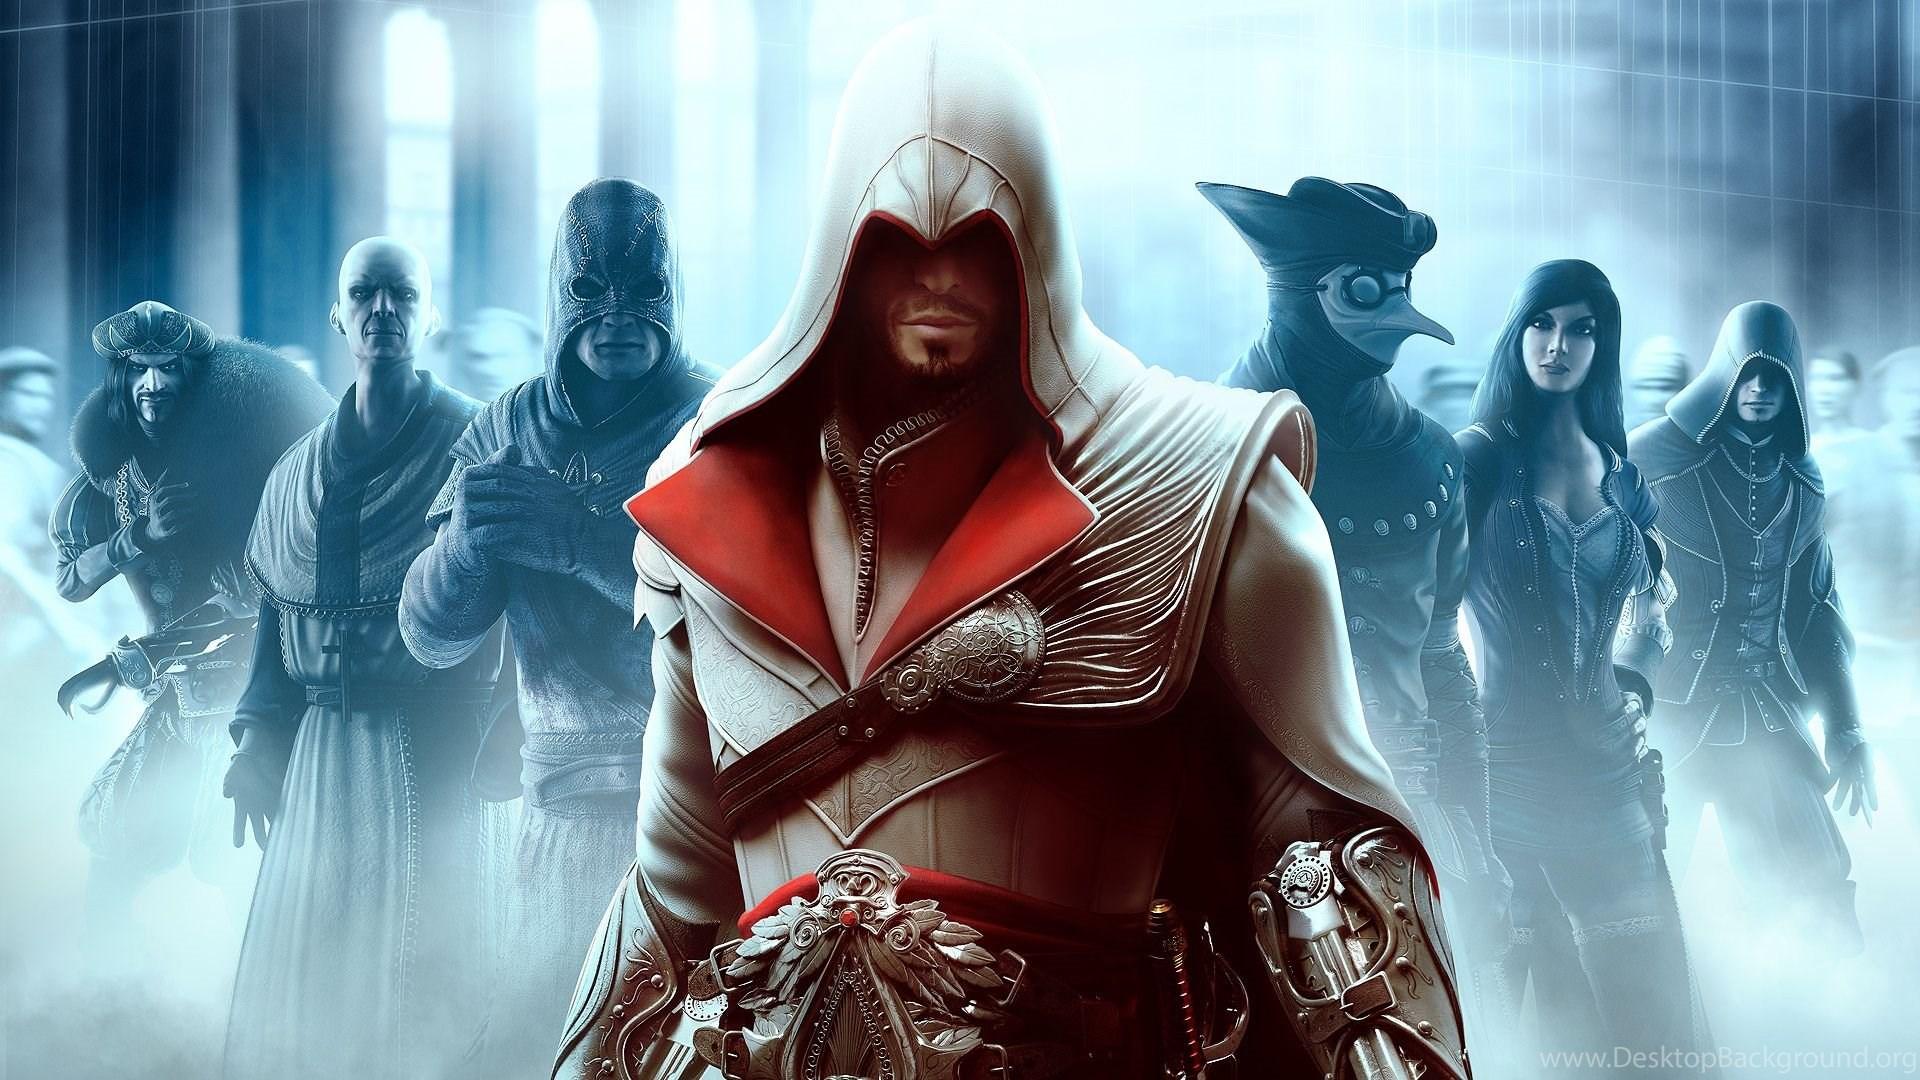 Assassins Creed Revelations Ezio Wallpapers Desktop Background